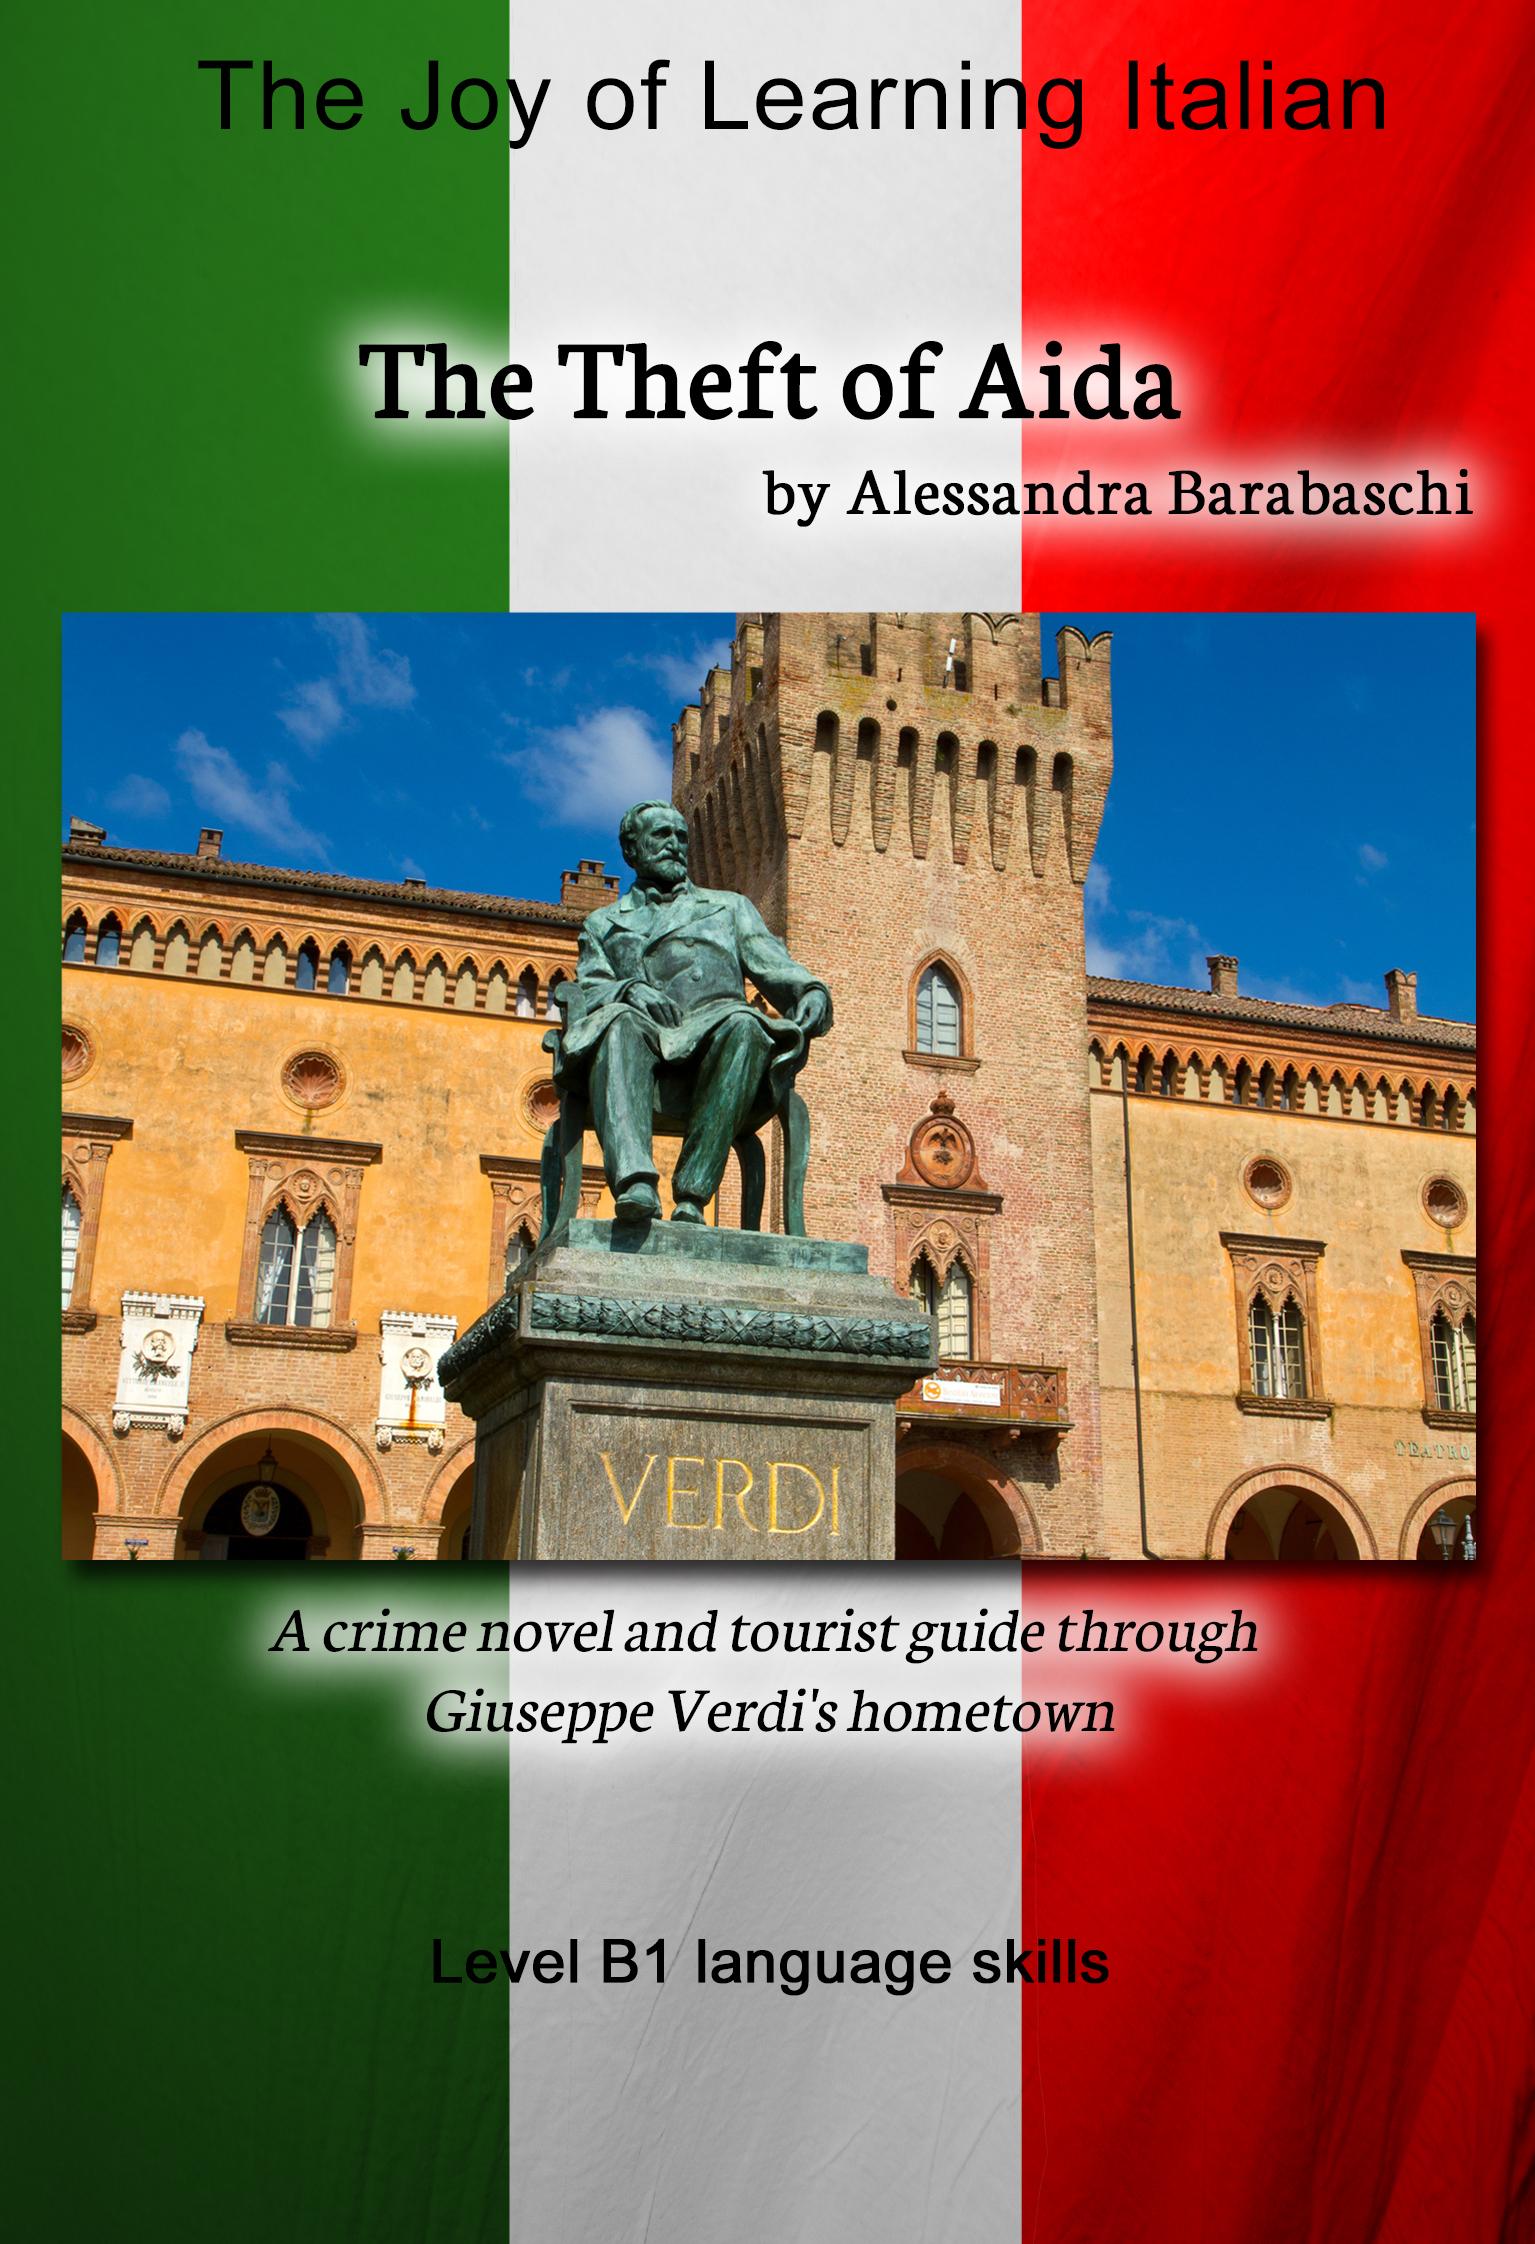 Alessandra Barabaschi The Theft of Aida - Language Course Italian Level B1 gateway student's book premium level b1